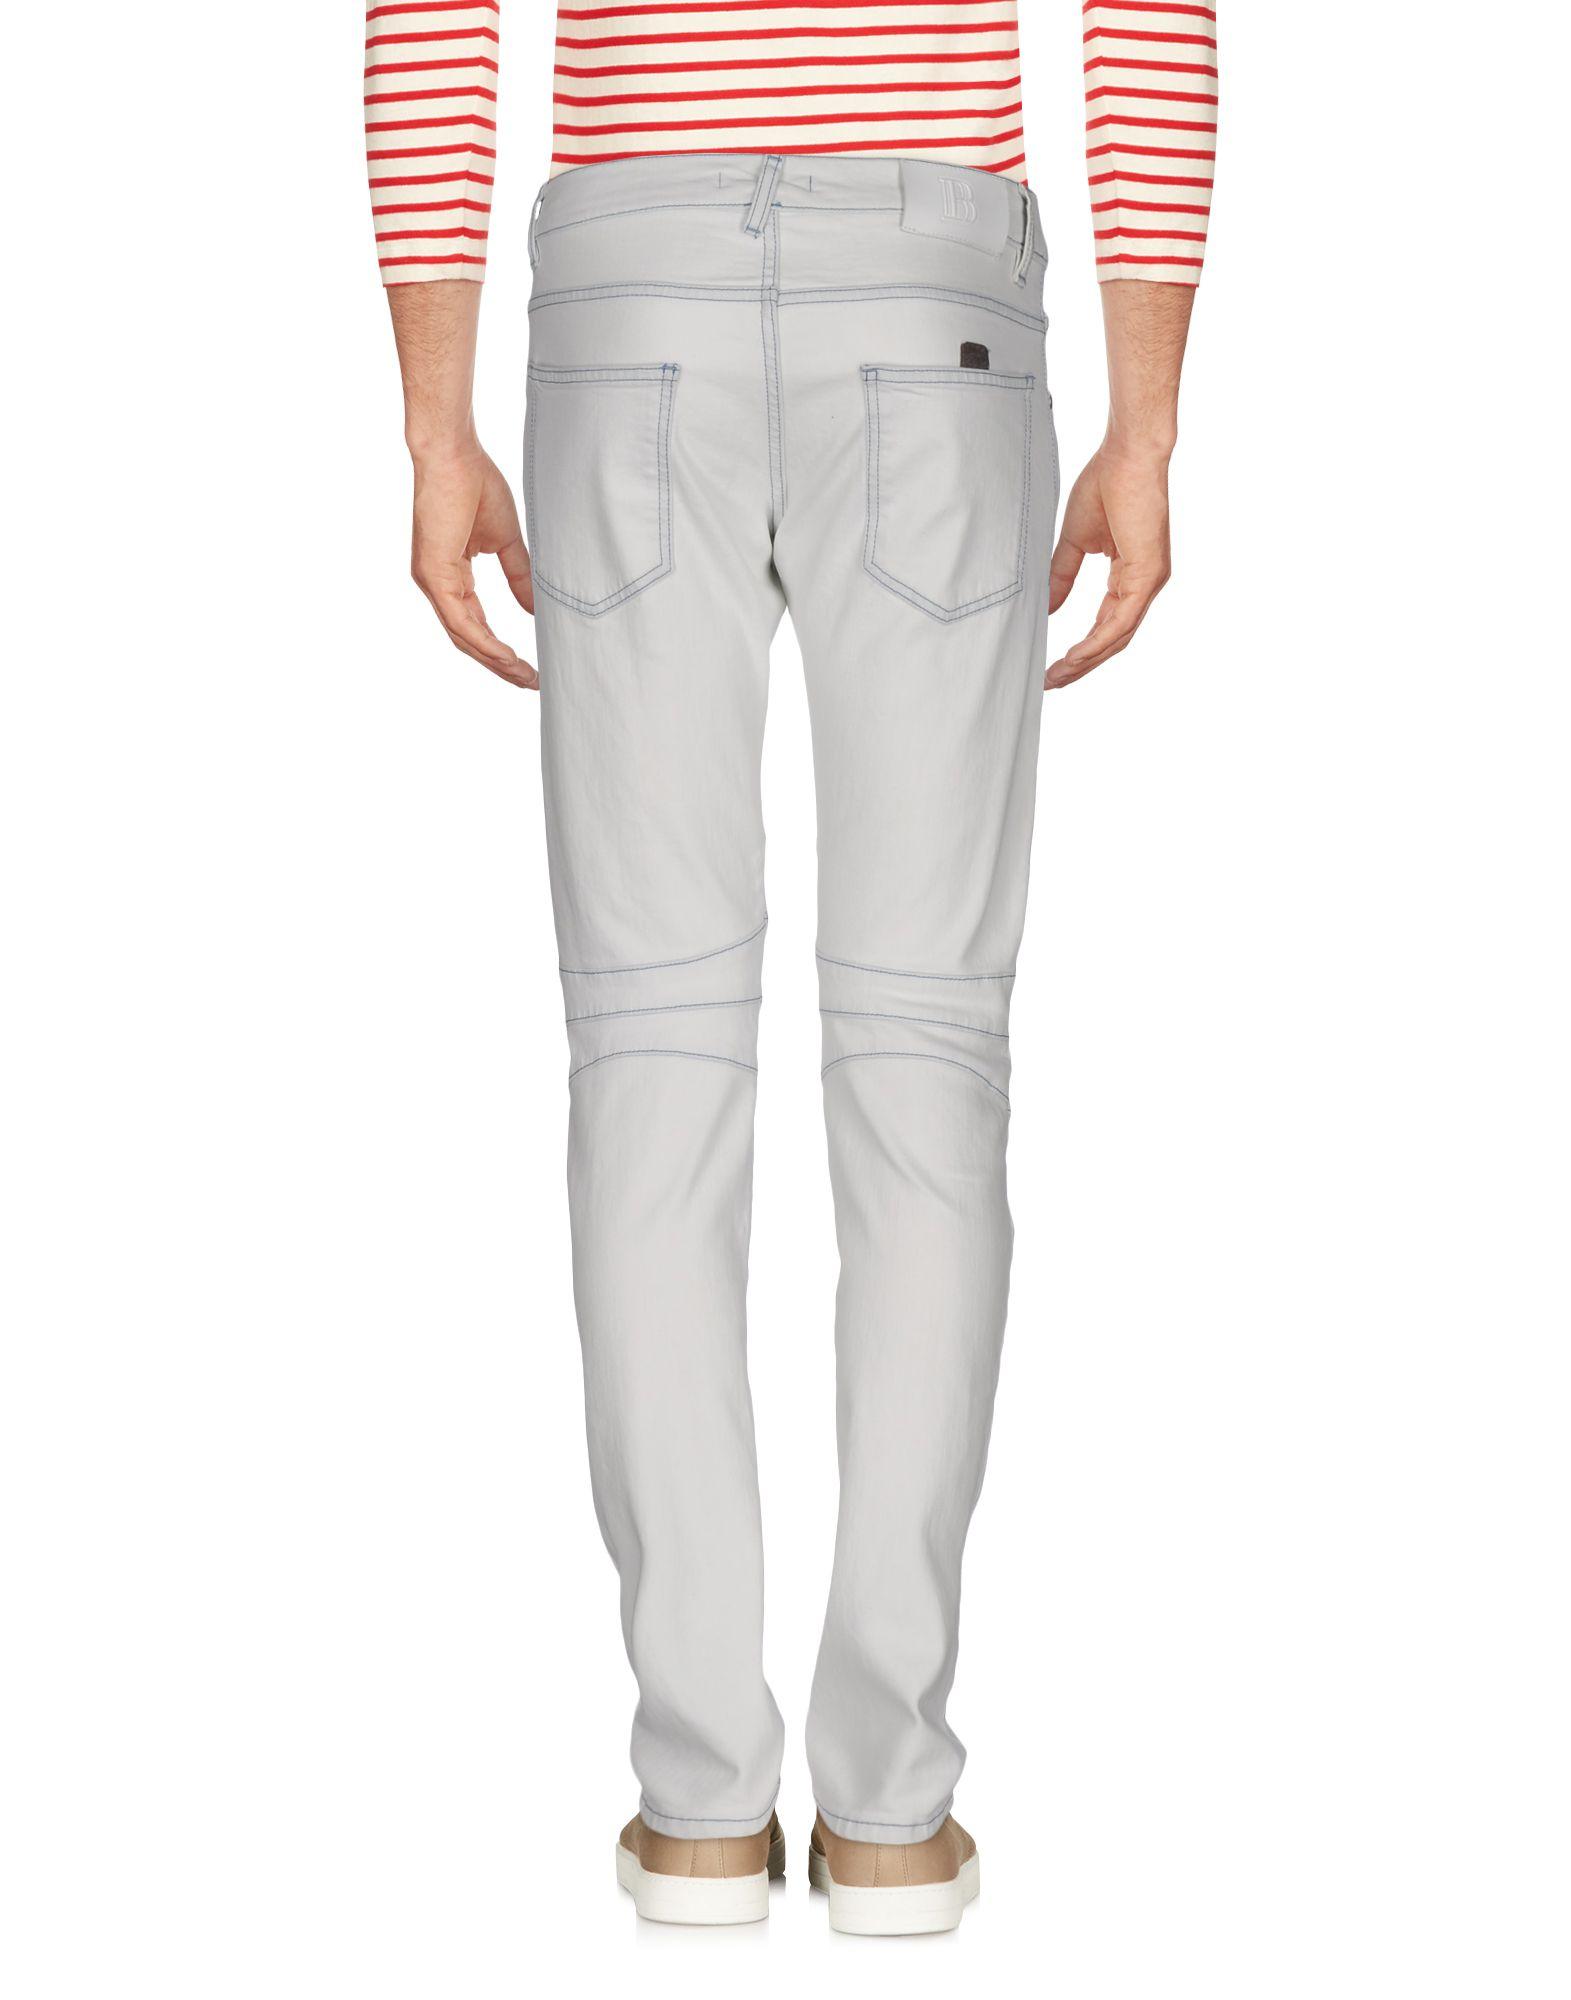 Pantaloni Jeans Pierre Uomo Balmain Uomo Pierre - 42553807KF dd8da4